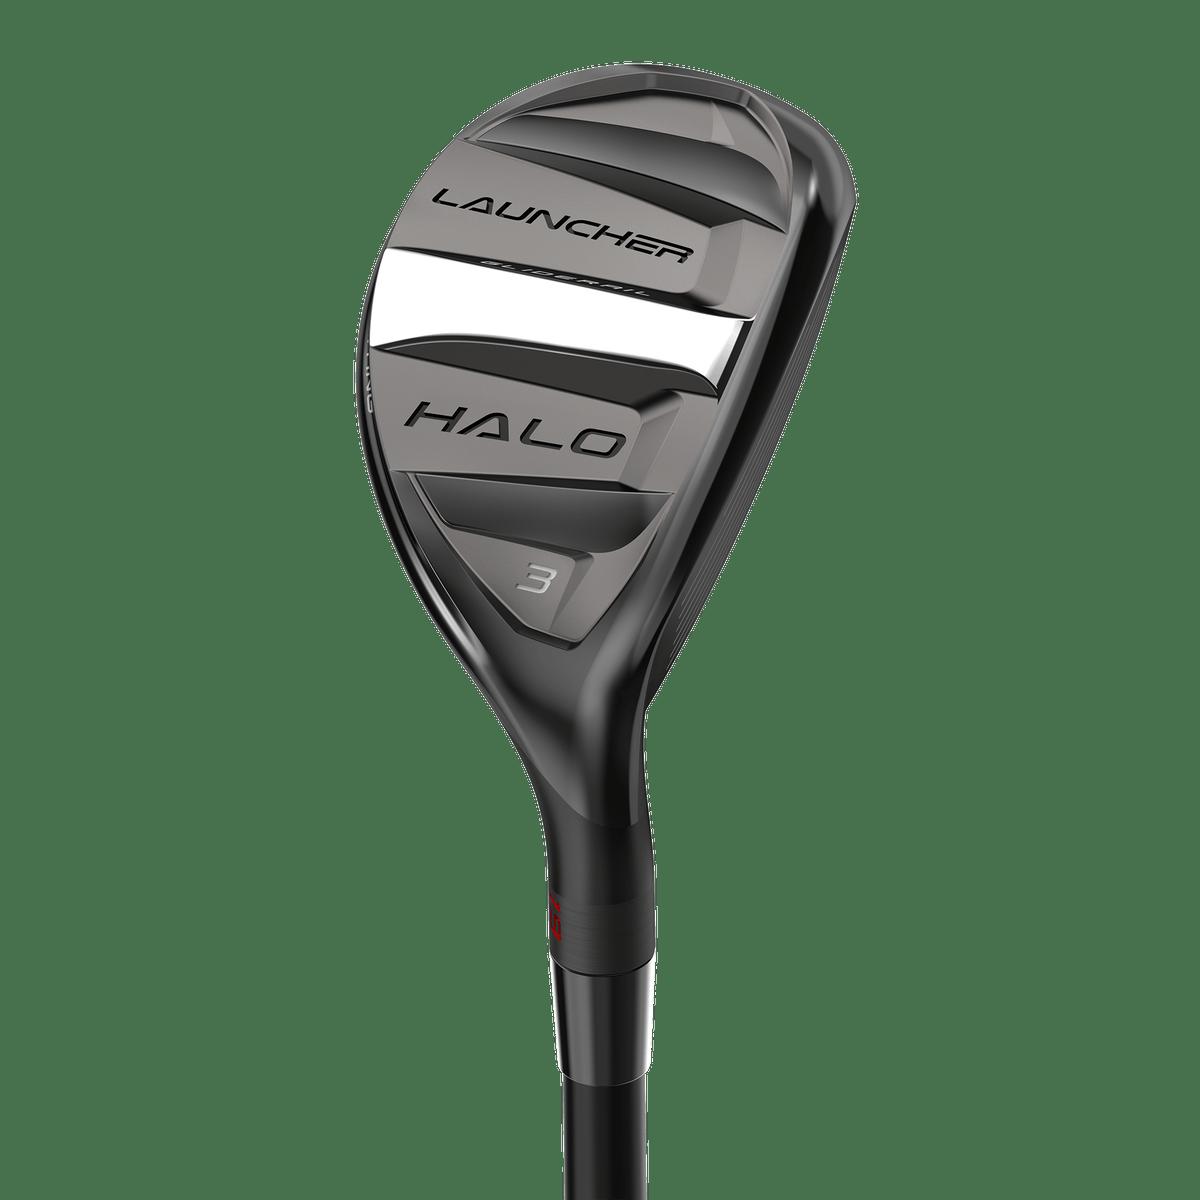 Cleveland Women's Launcher HB Halo Hybrid